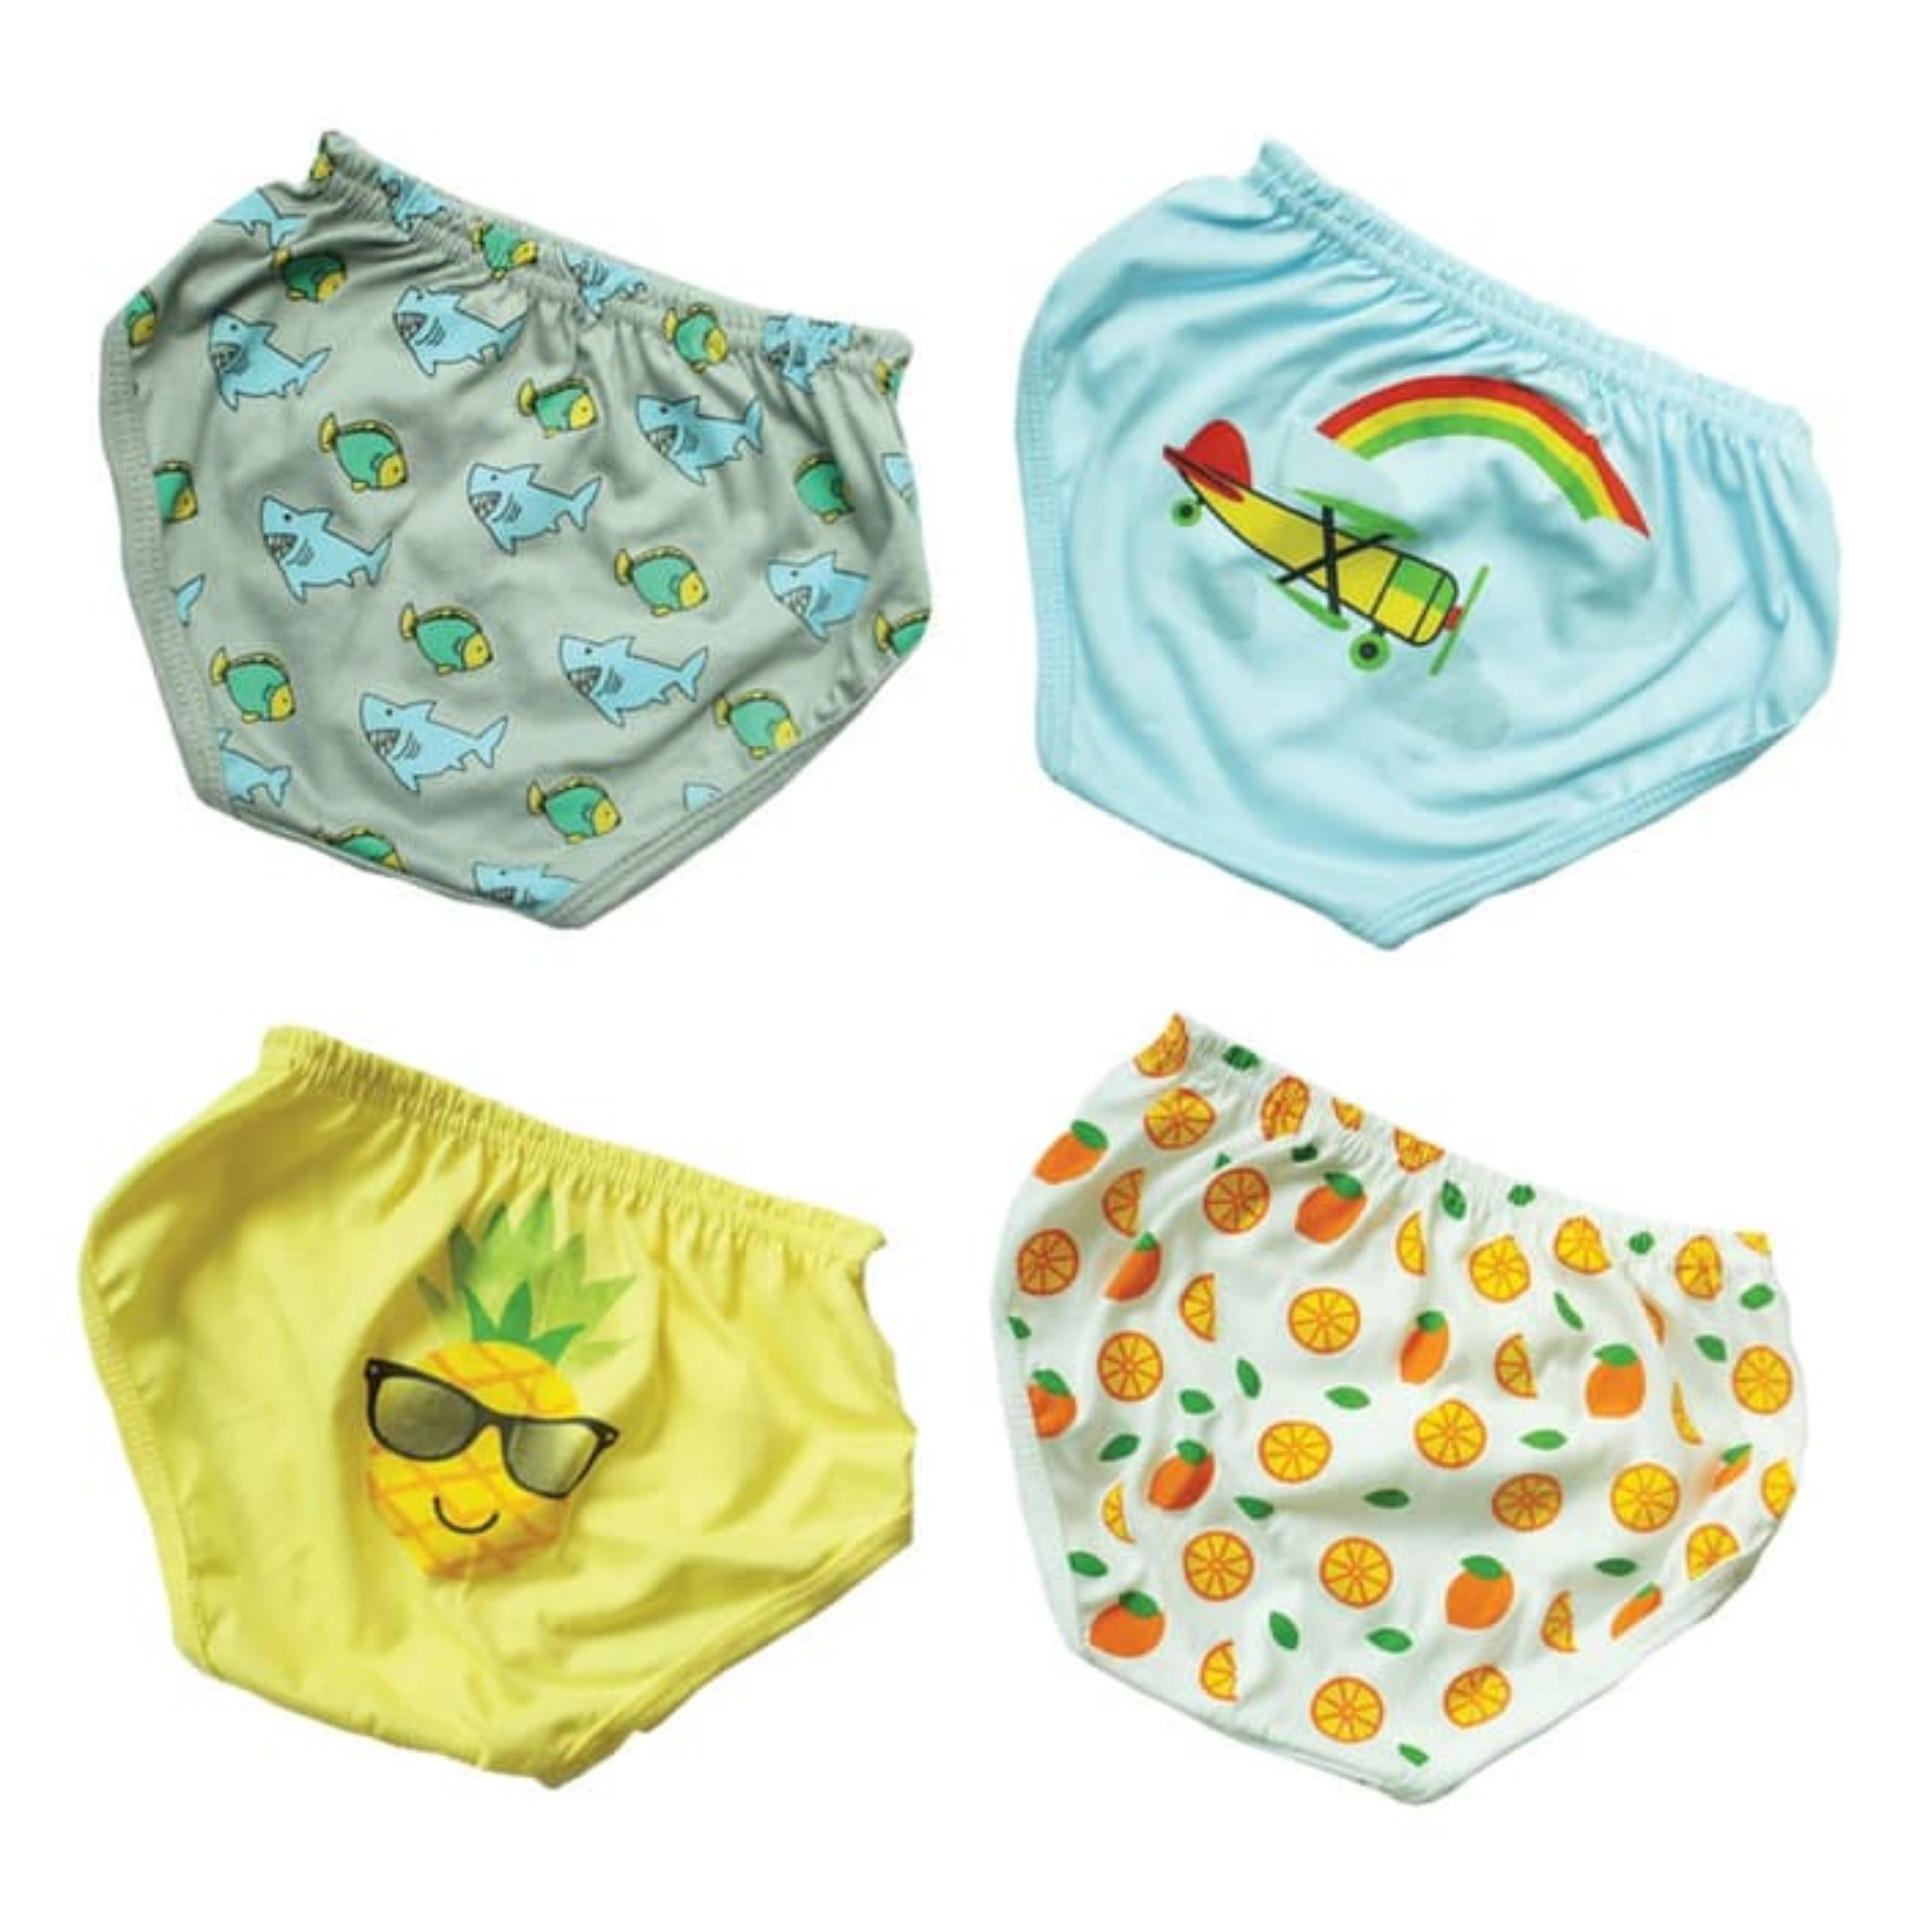 Celana Bayi Laki Terbaik Jegging Anak Size L 4 5 6 Tahun Jeging Panjang Joger Kazel Jobel Boys Underwear Baby Shark Edition Dalam 4in1